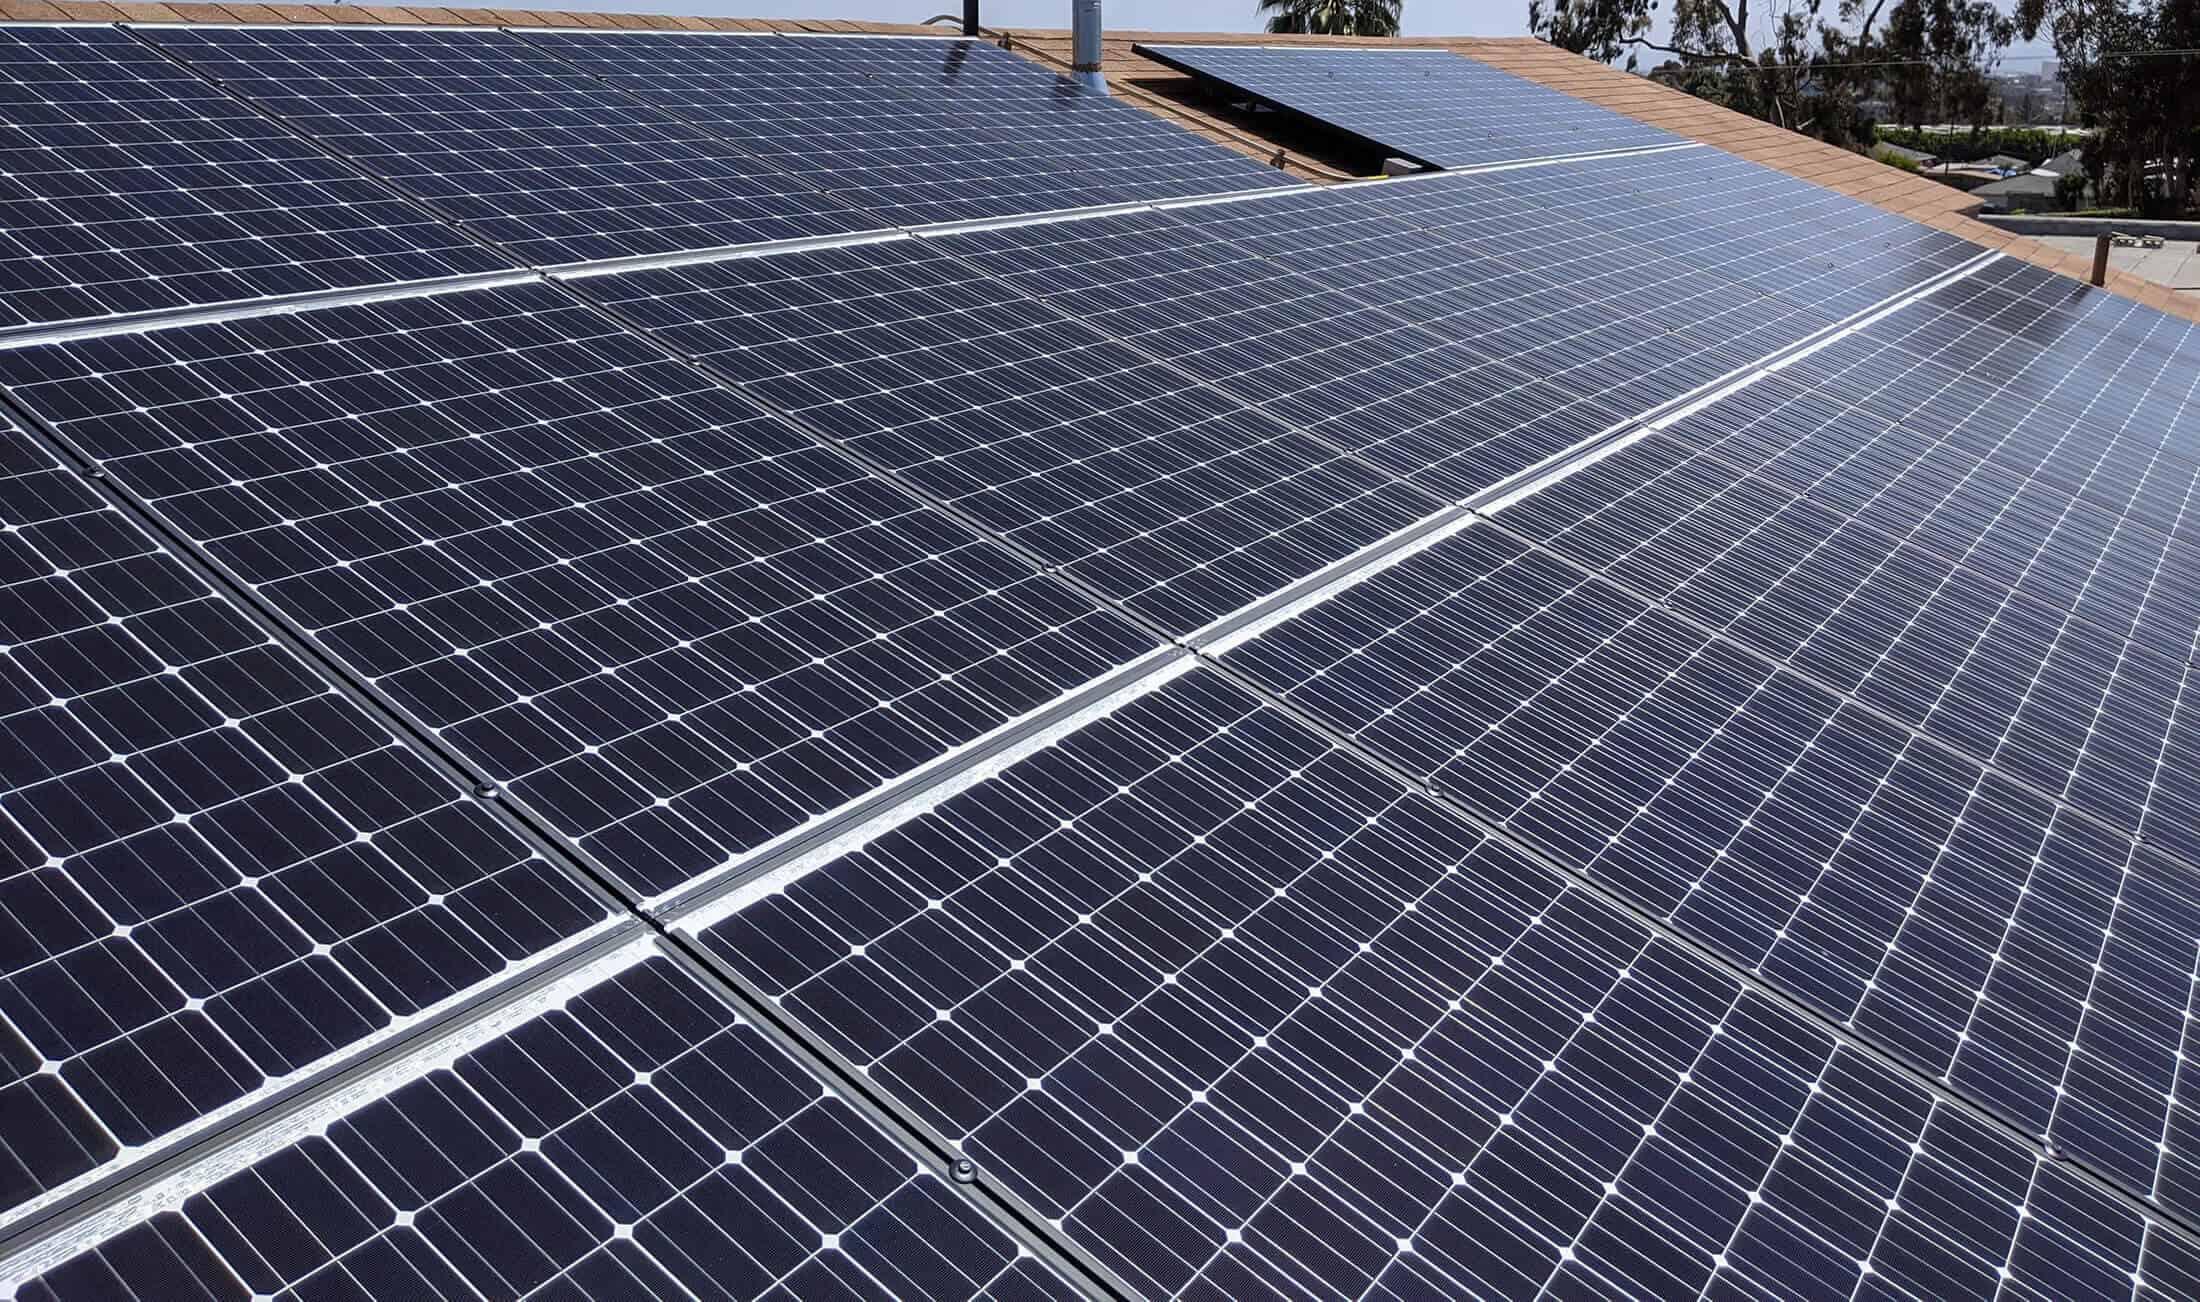 San Diego Solar Installations Getting Cheaper and Cheaper?